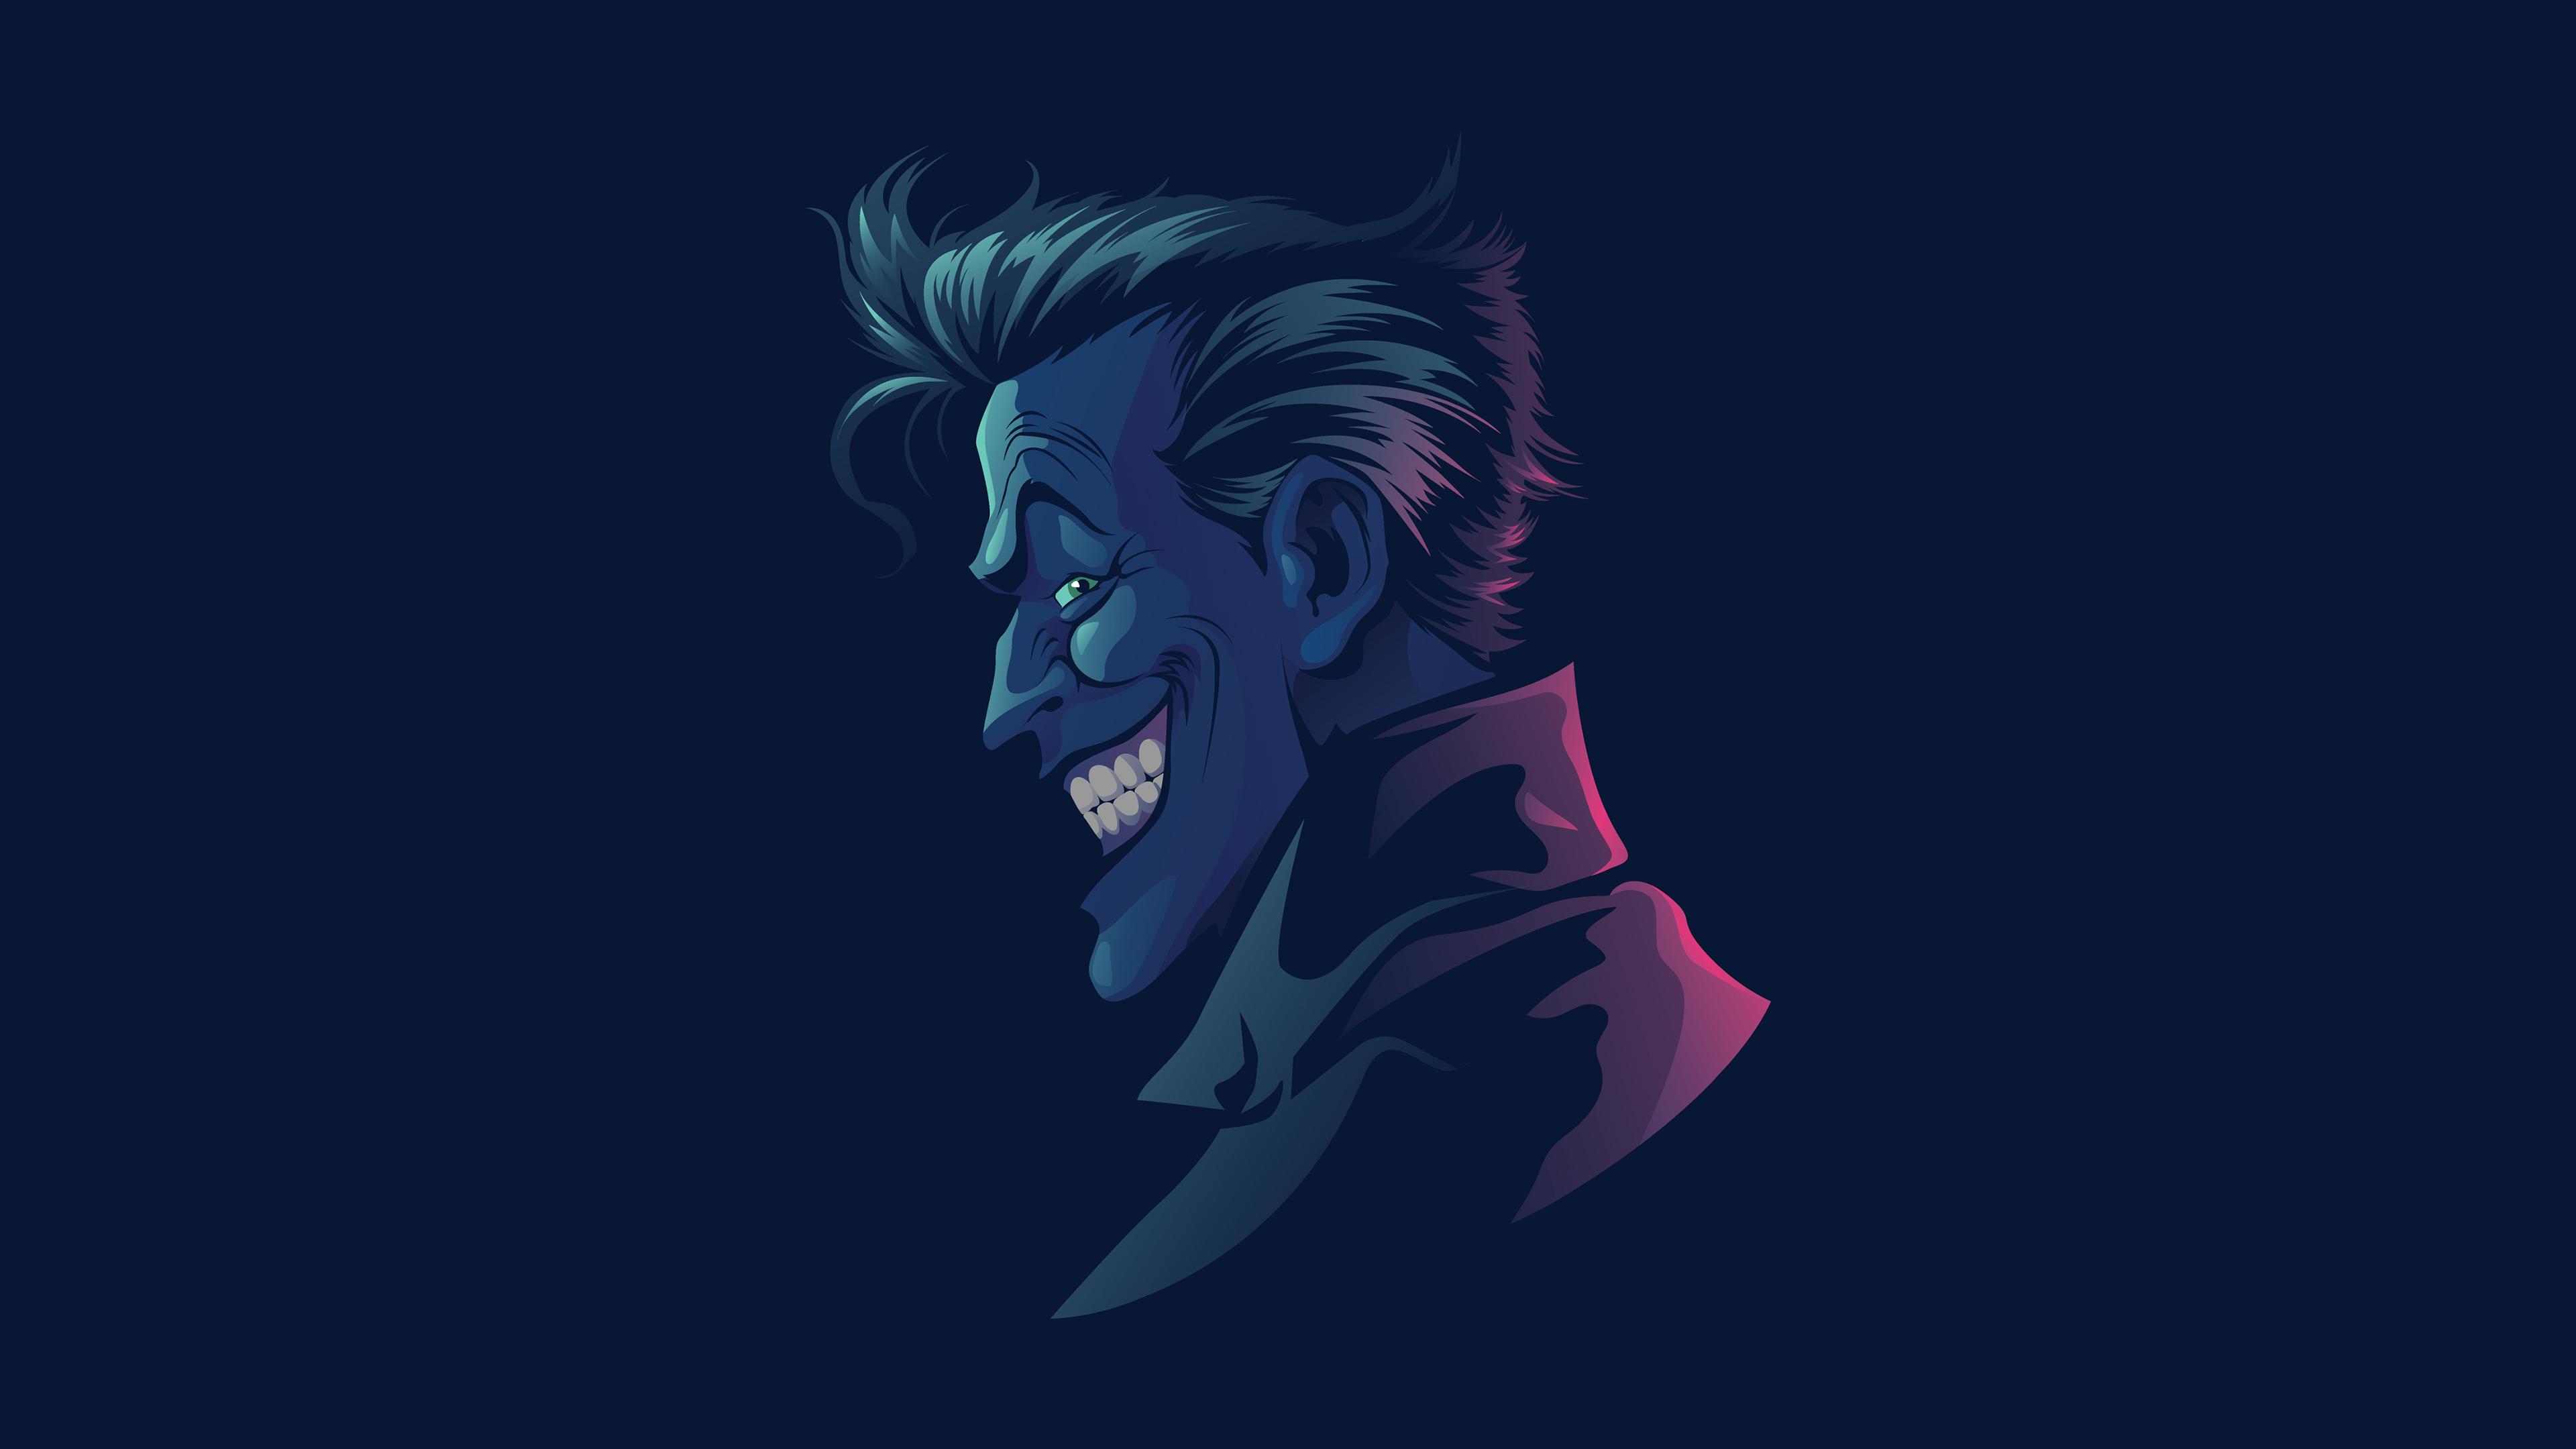 General 3840x2160 digital digital art artwork illustration character design  fictional fictional character comics DC Comics DC Universe villain villains Villains Gallery simple simple background vector art vector graphics Joker Vectto minimalism